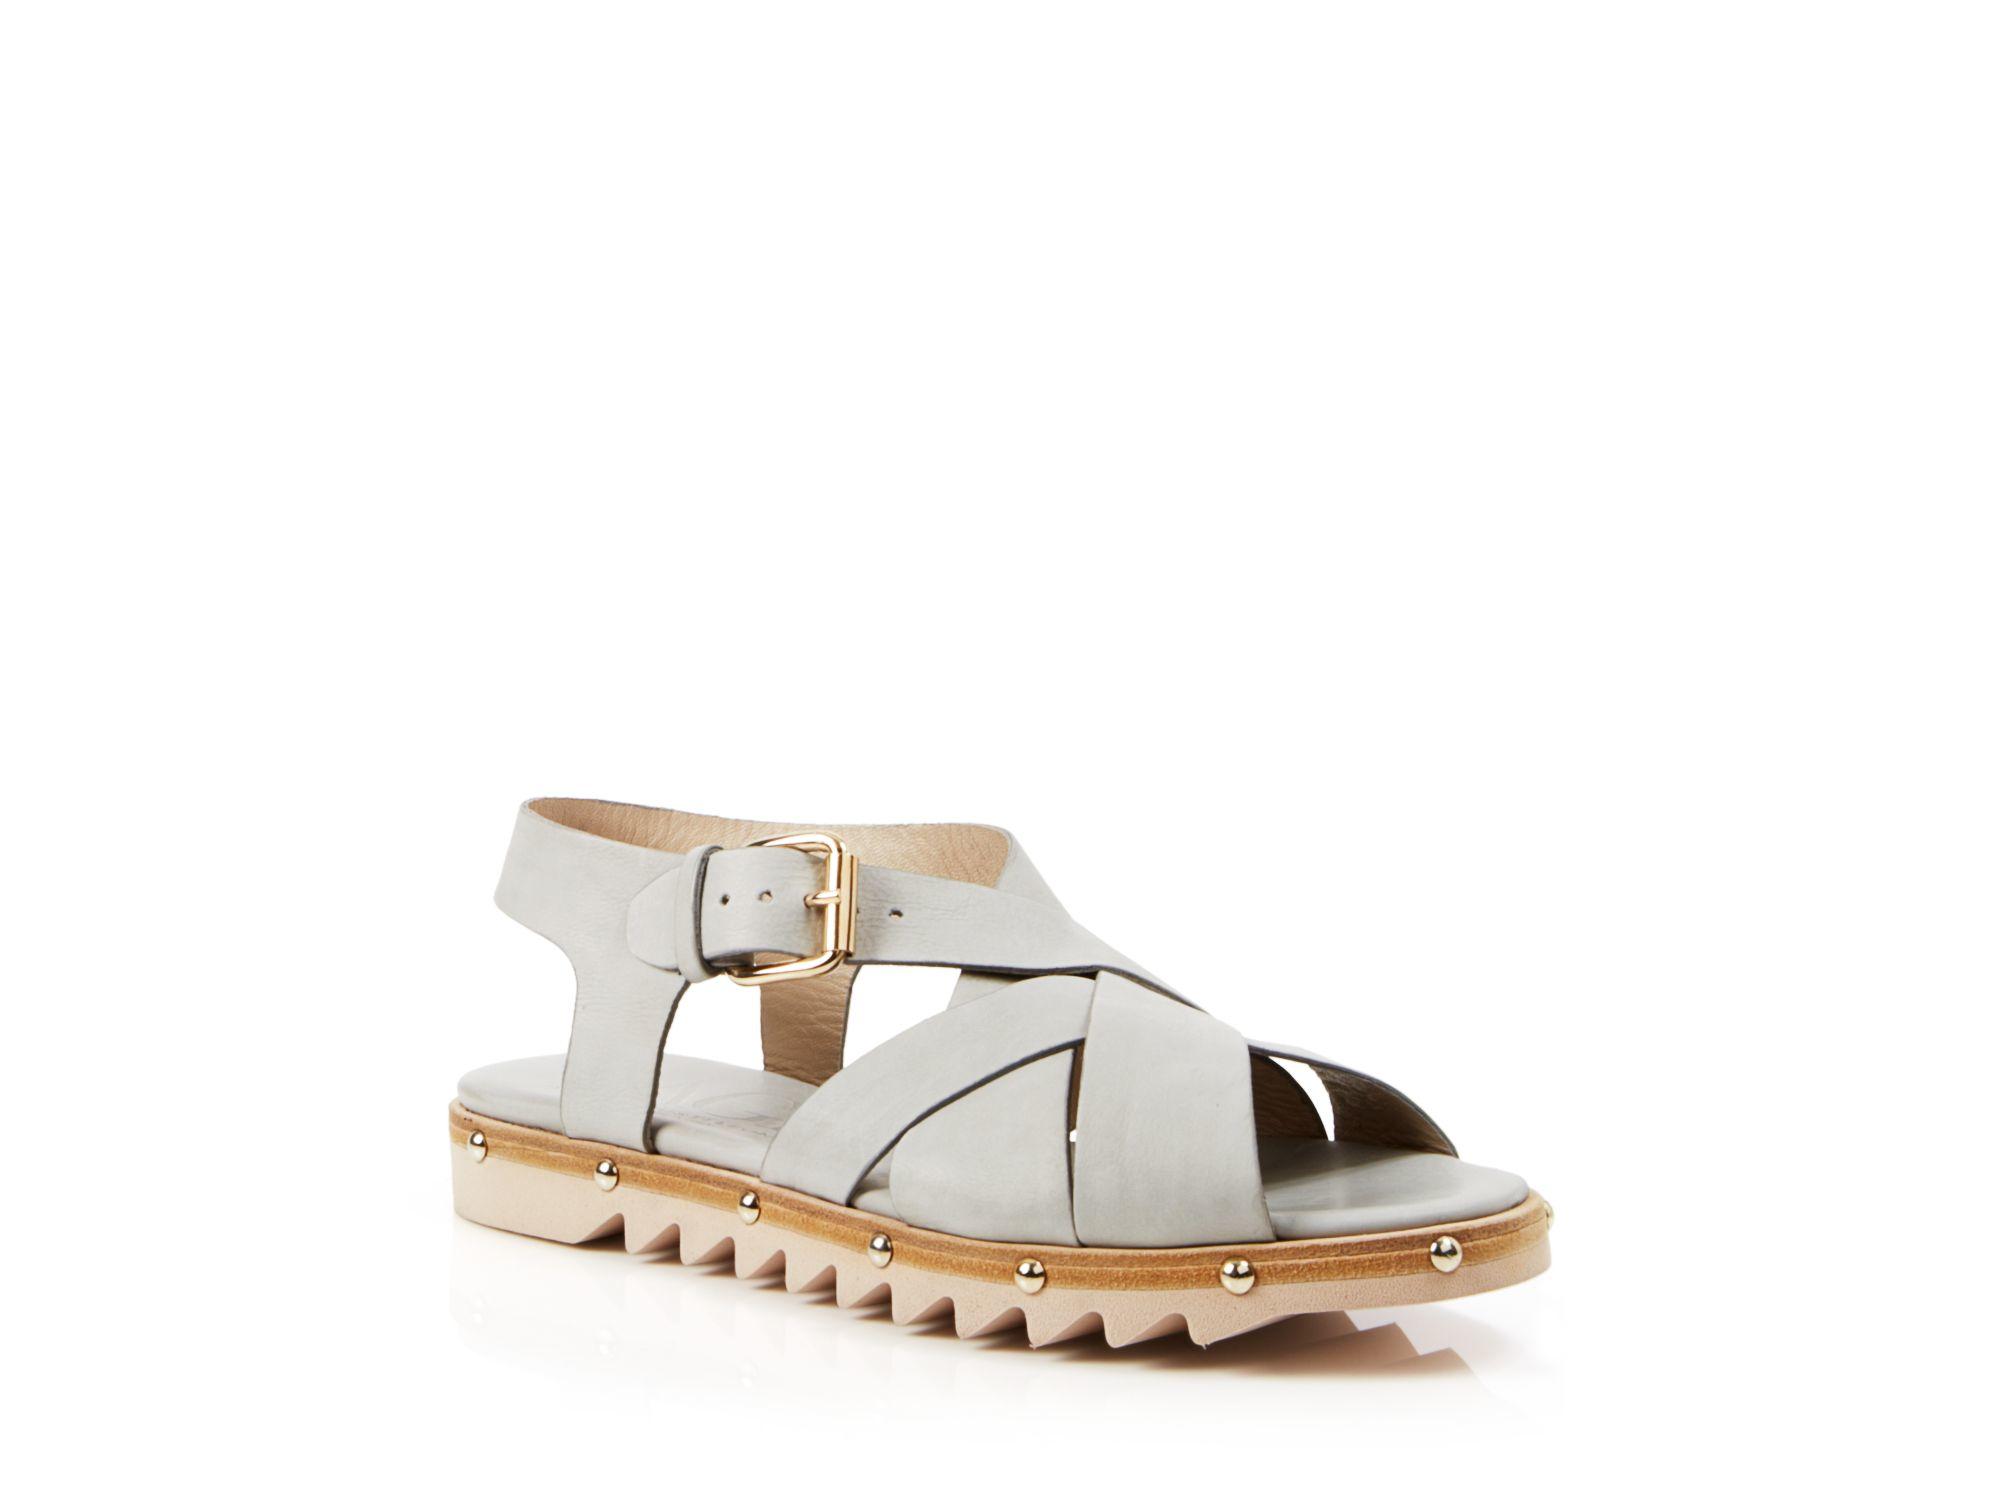 Chaussures - Sandales Attilio Giusti Leombruni 6PPhYs